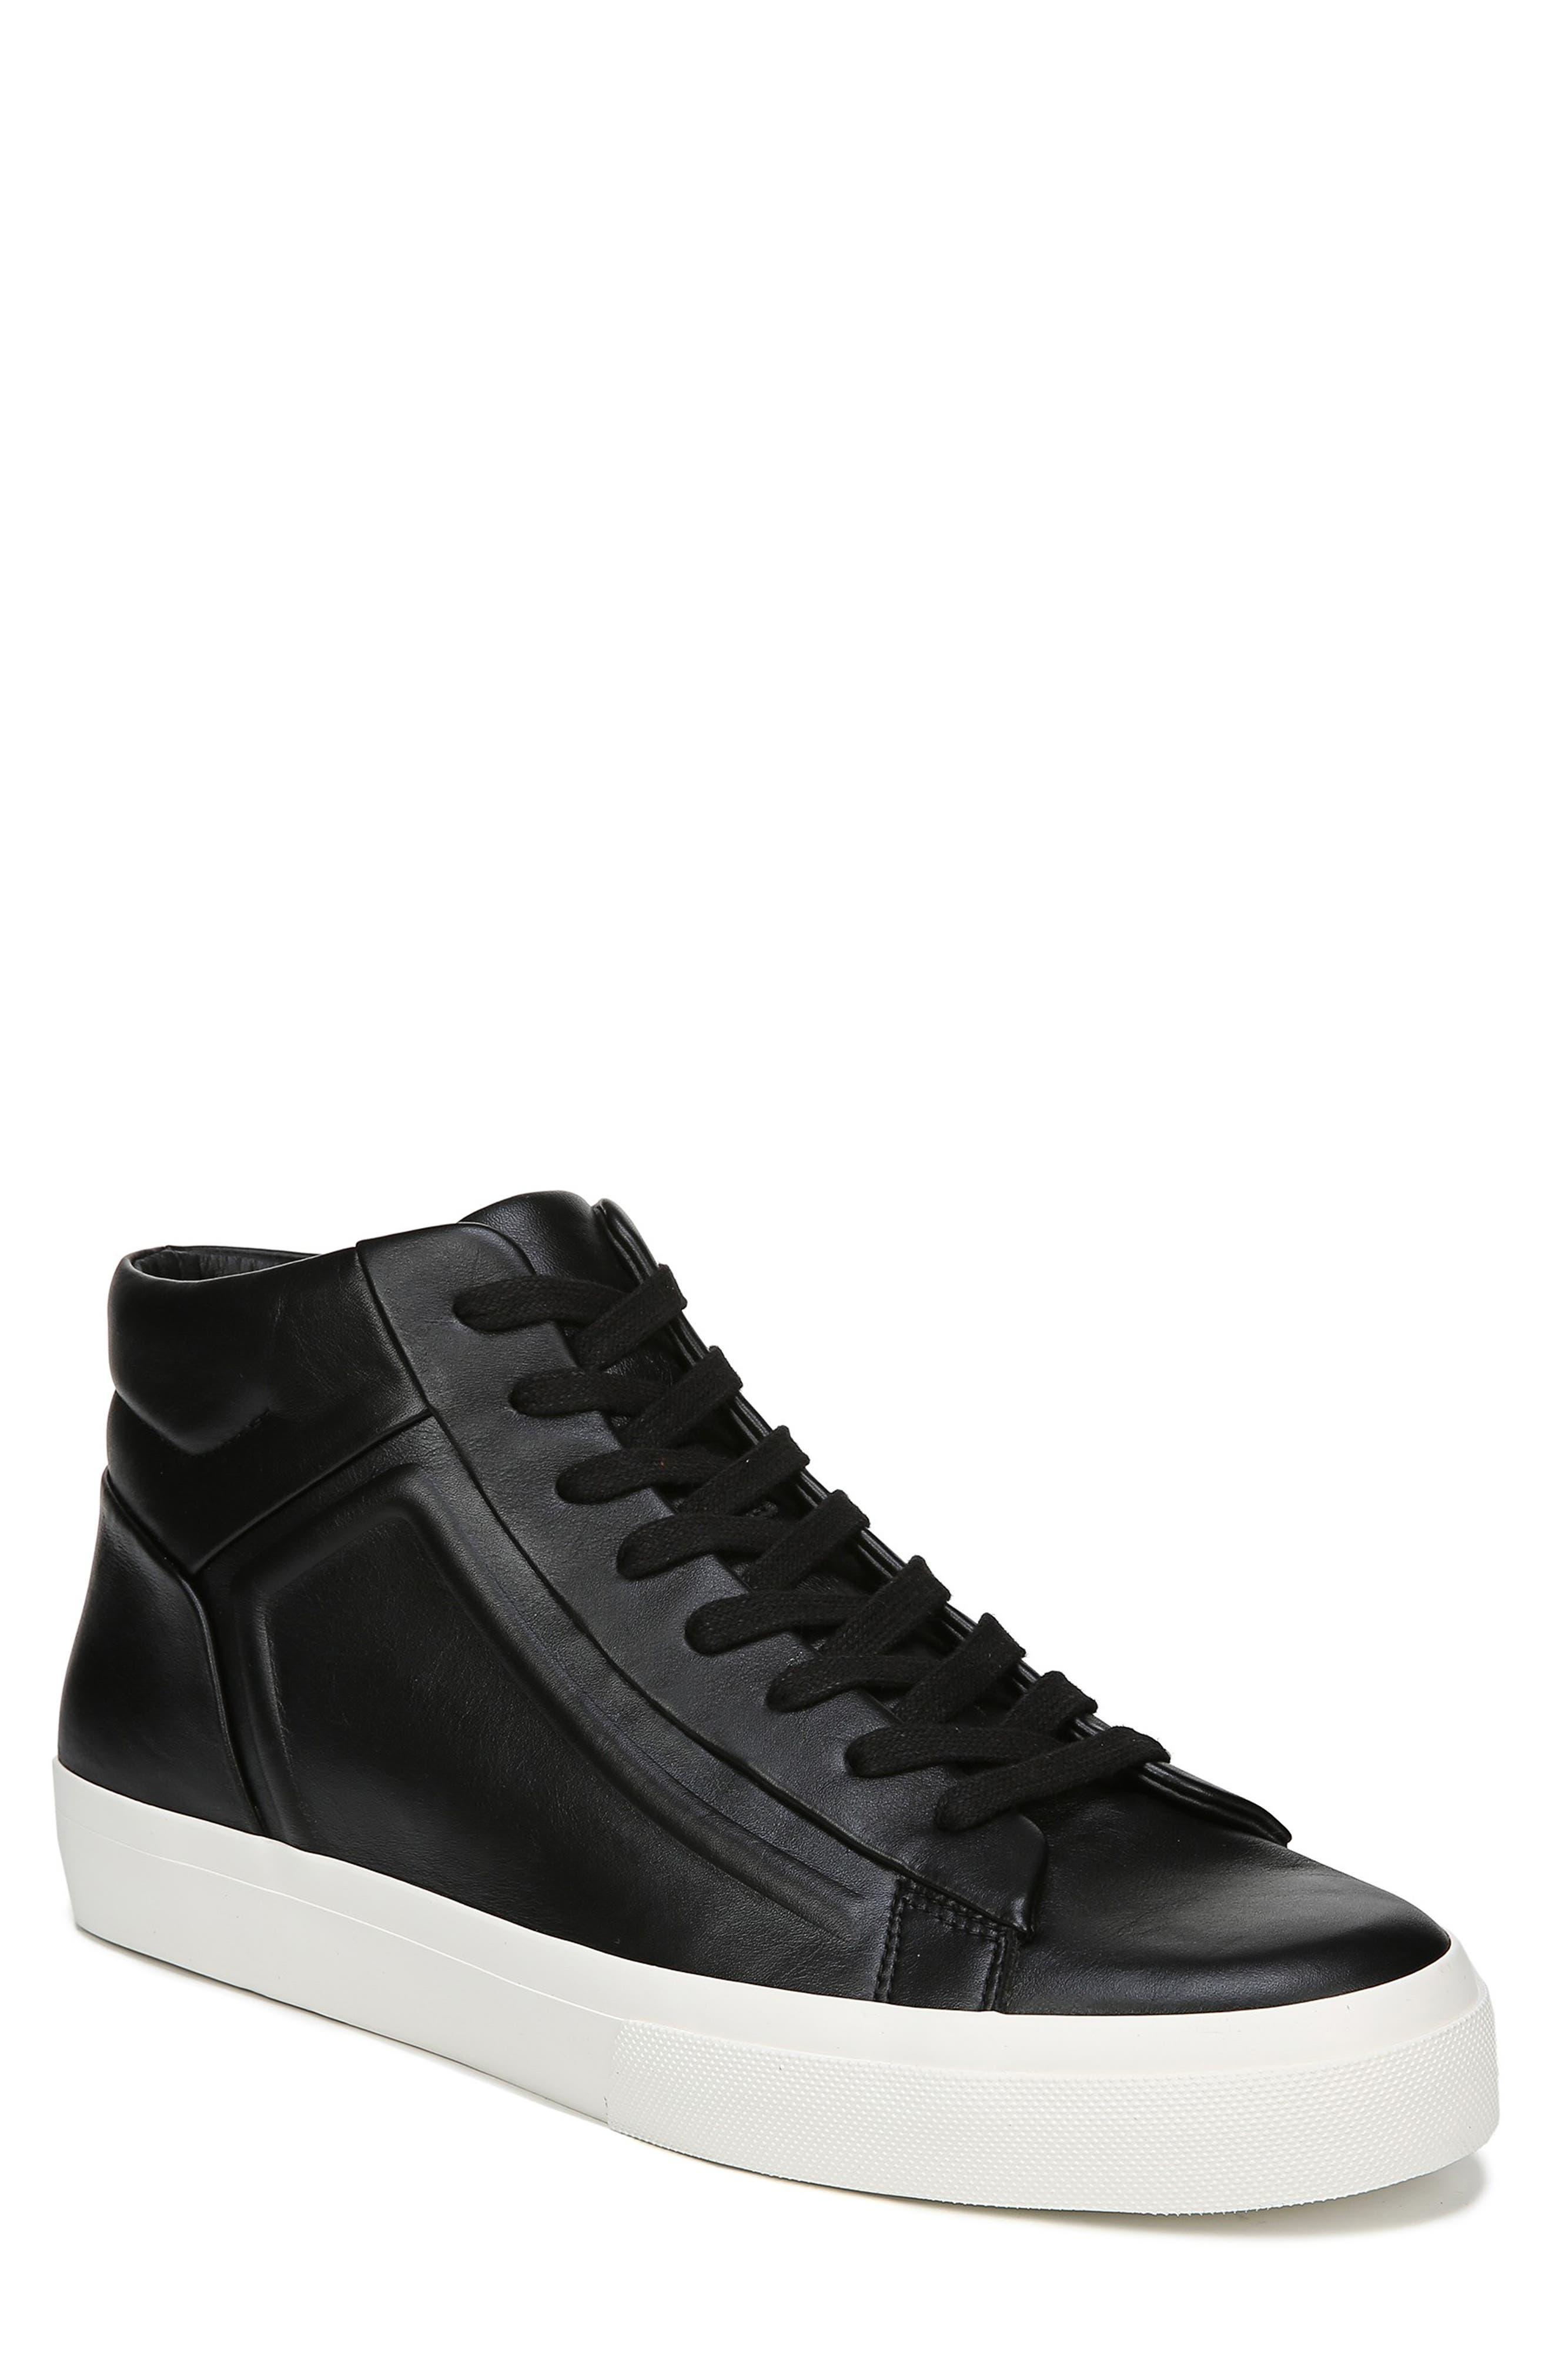 VINCE Fynn High Top Sneaker, Main, color, BLACK